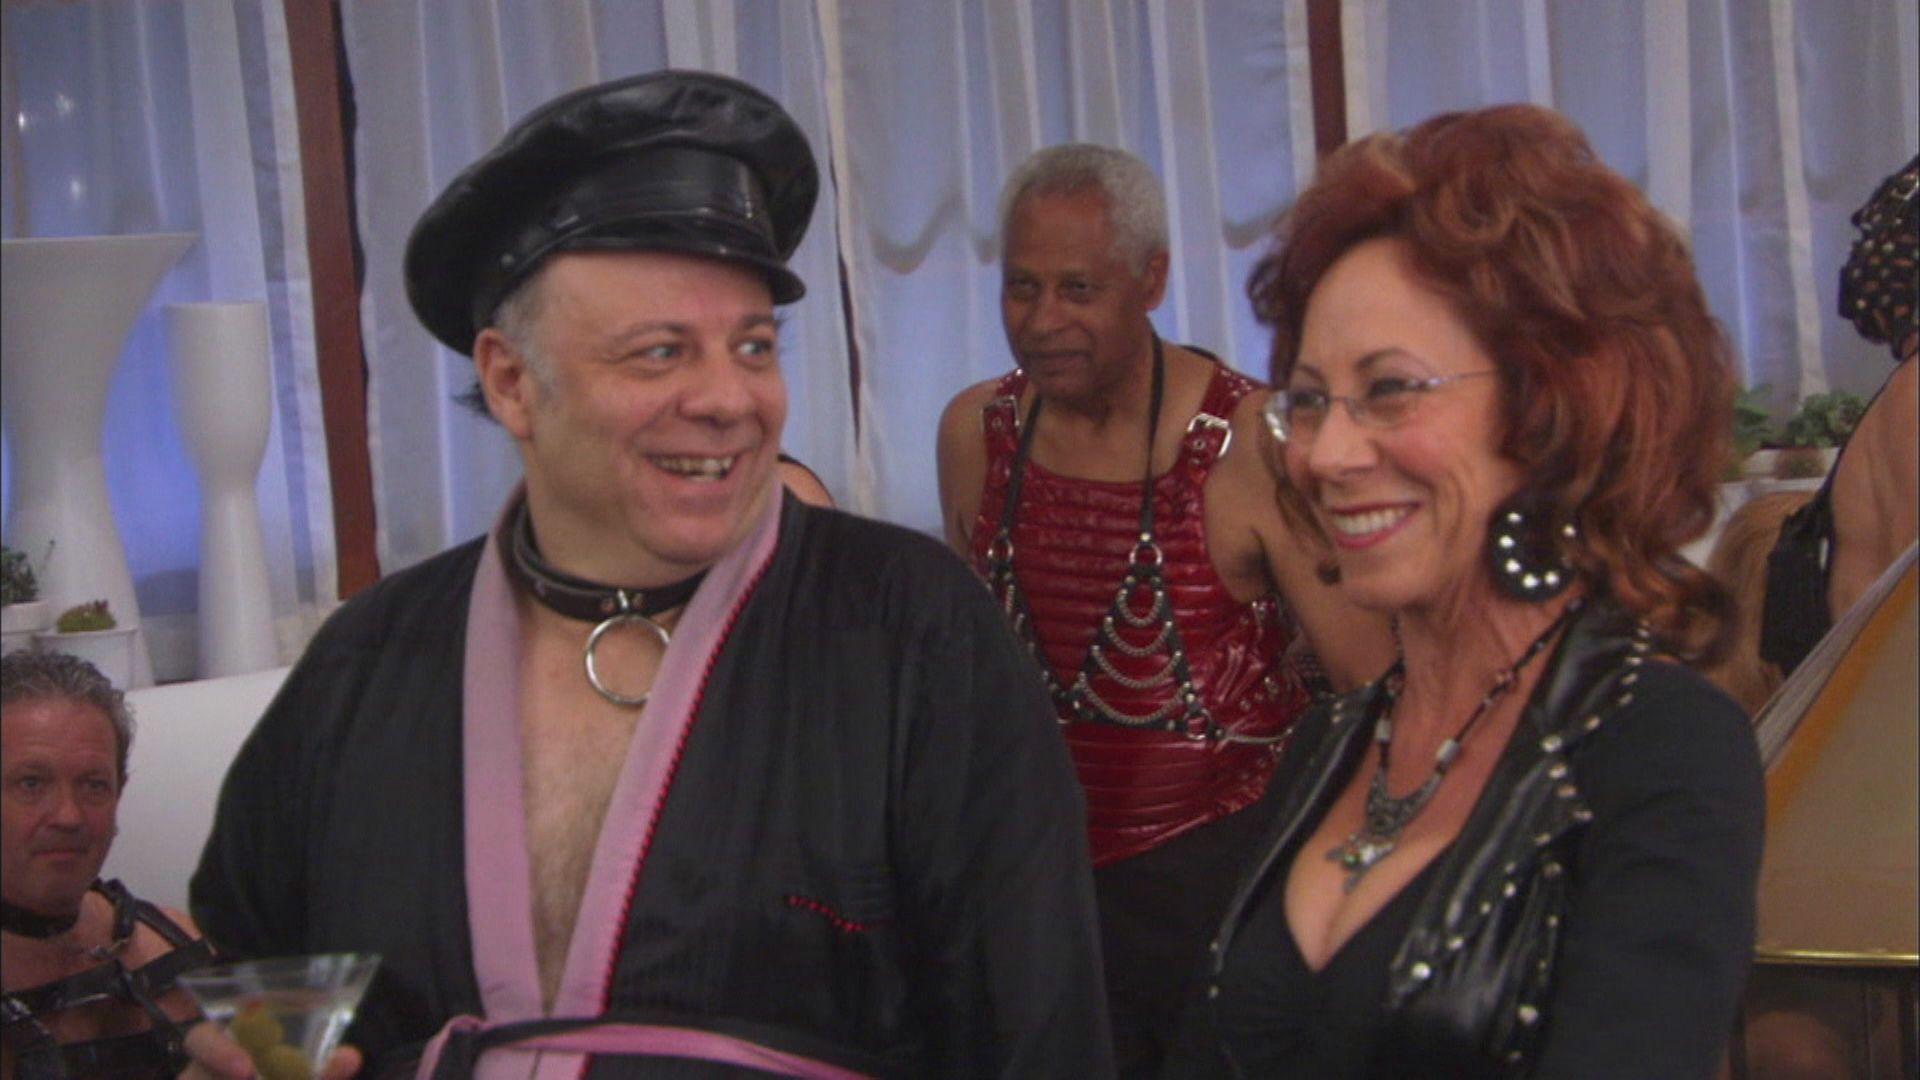 Key Party - Reno 911 Video Clip  Comedy Central-1005